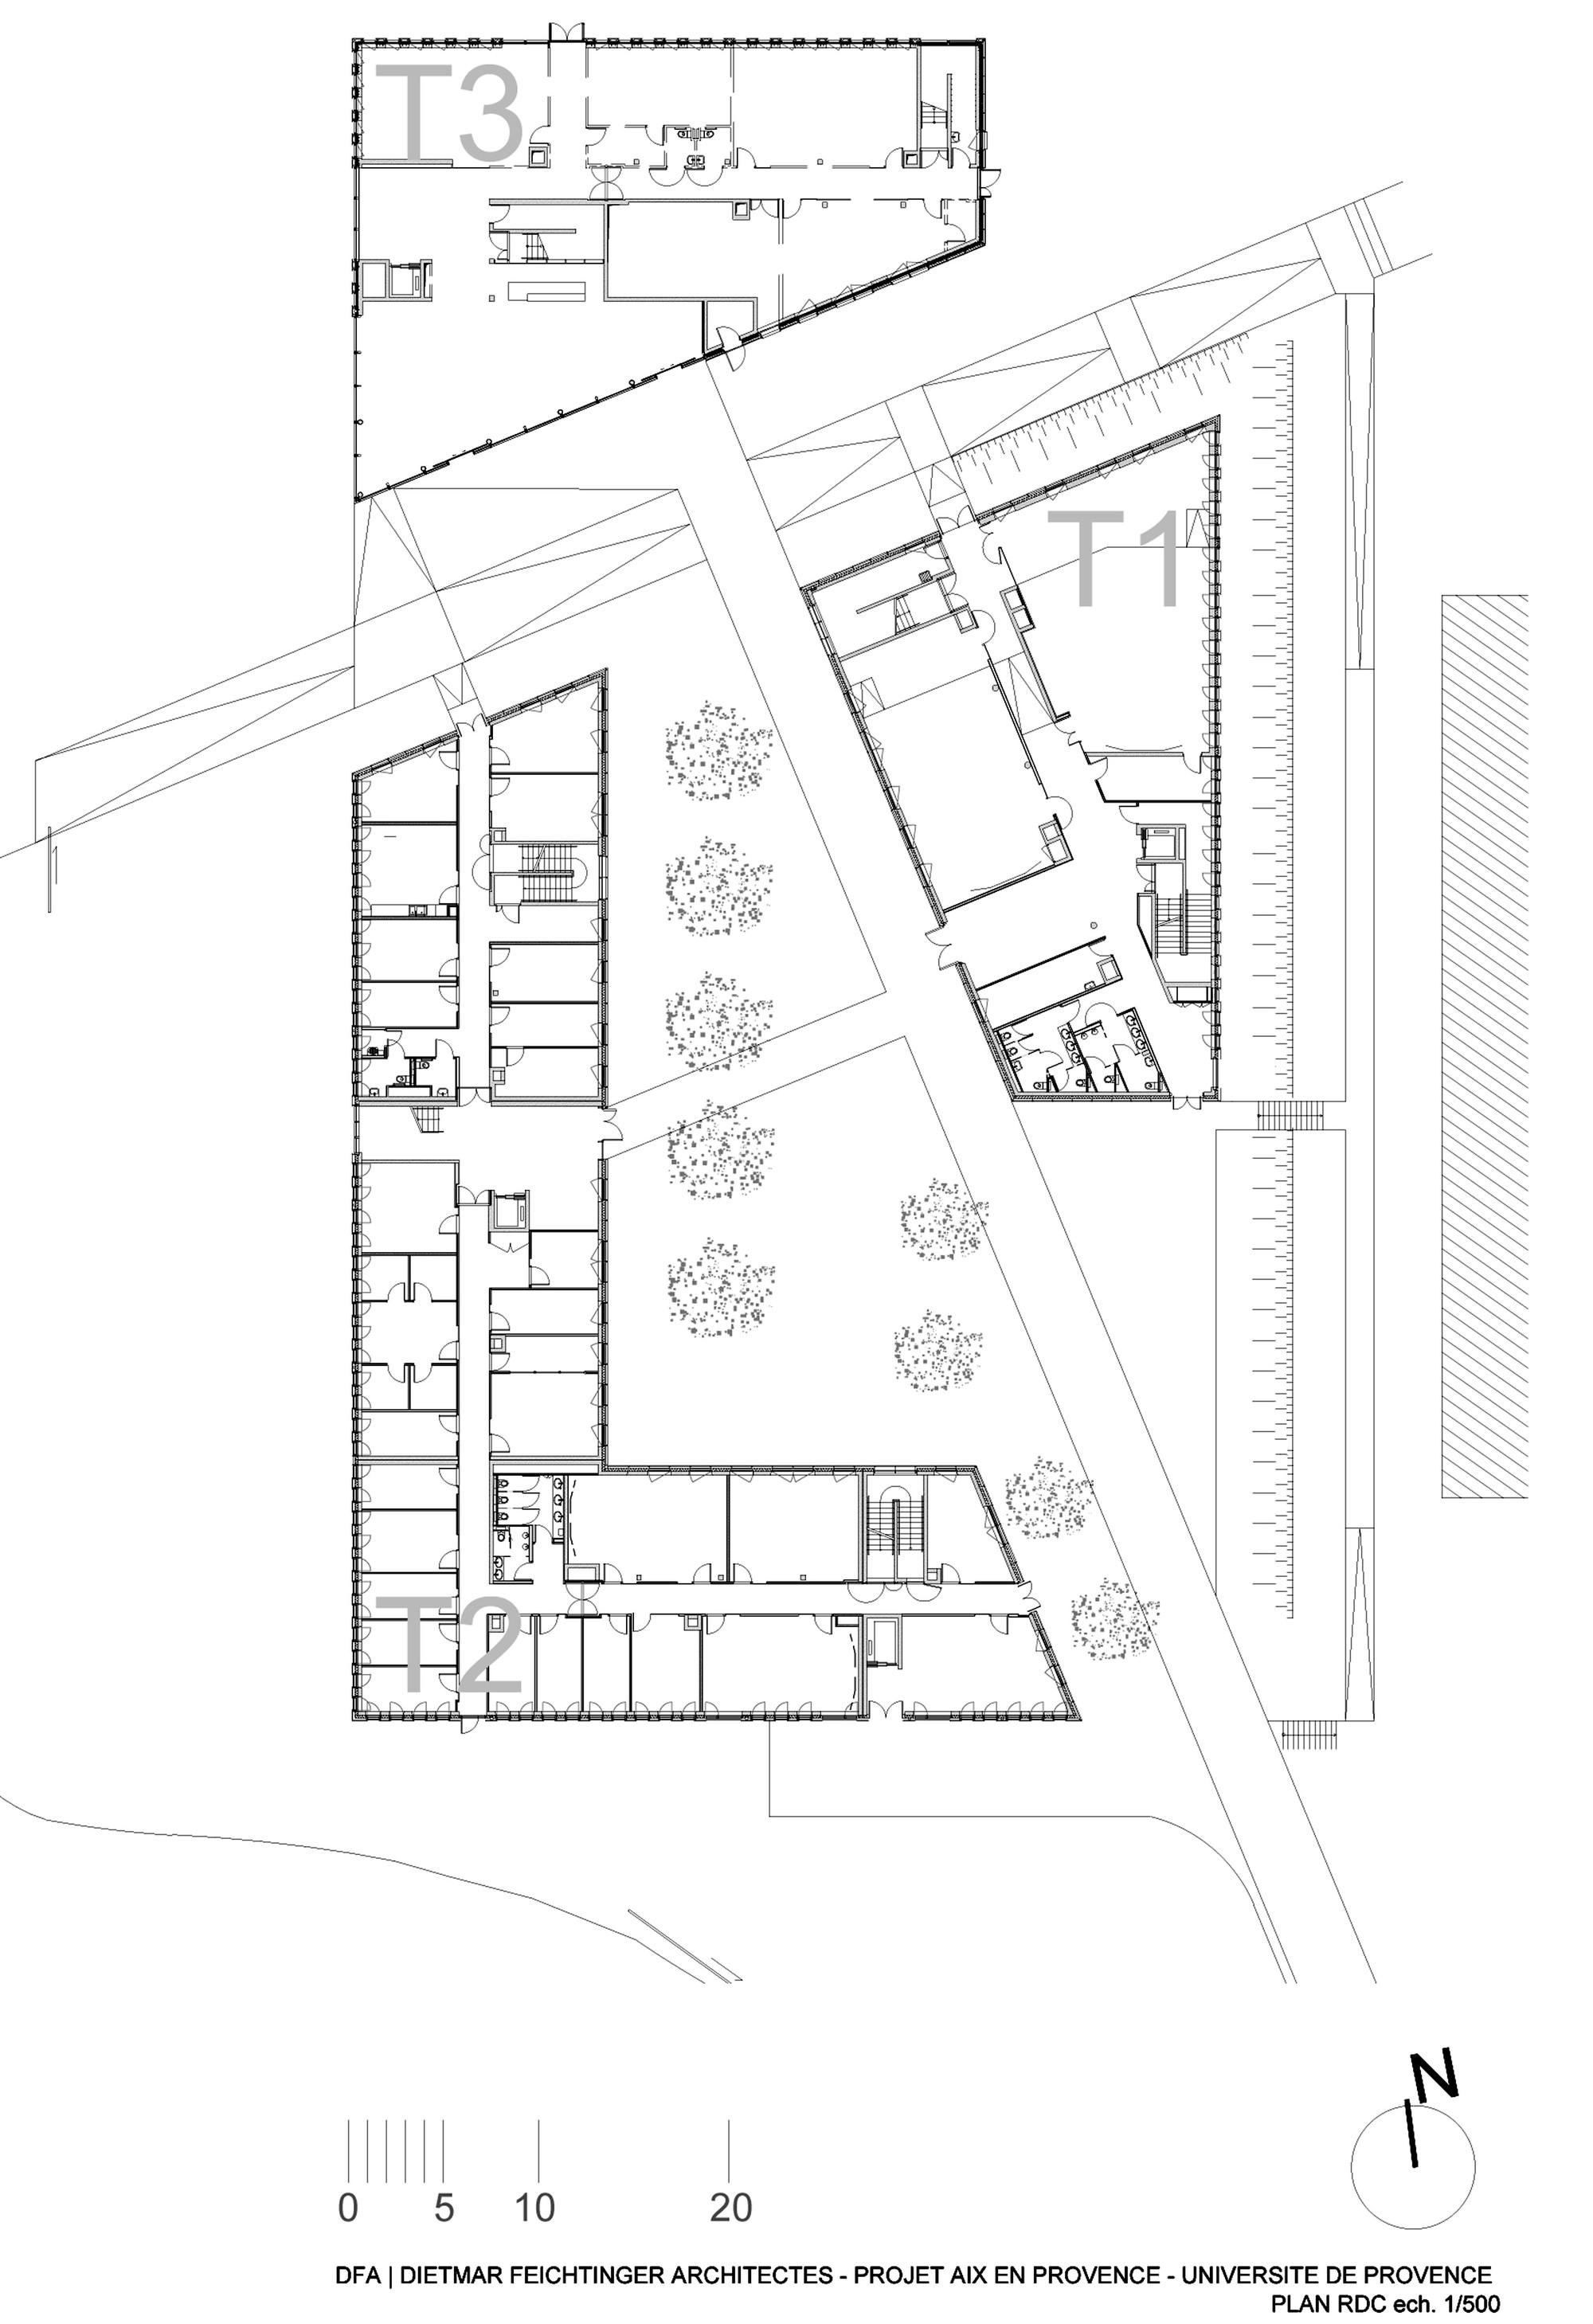 diagram for building